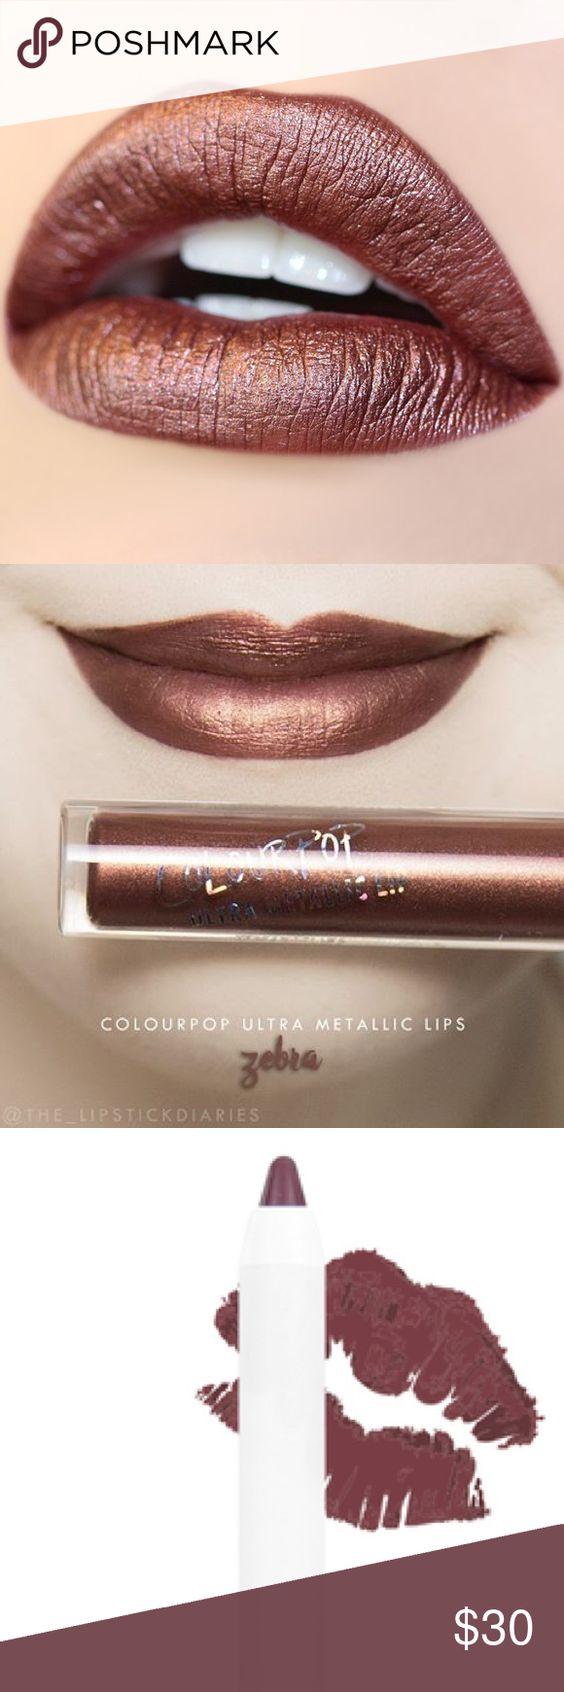 Liquid Lipstick, Chocolate Brown And Like U On Pinterest